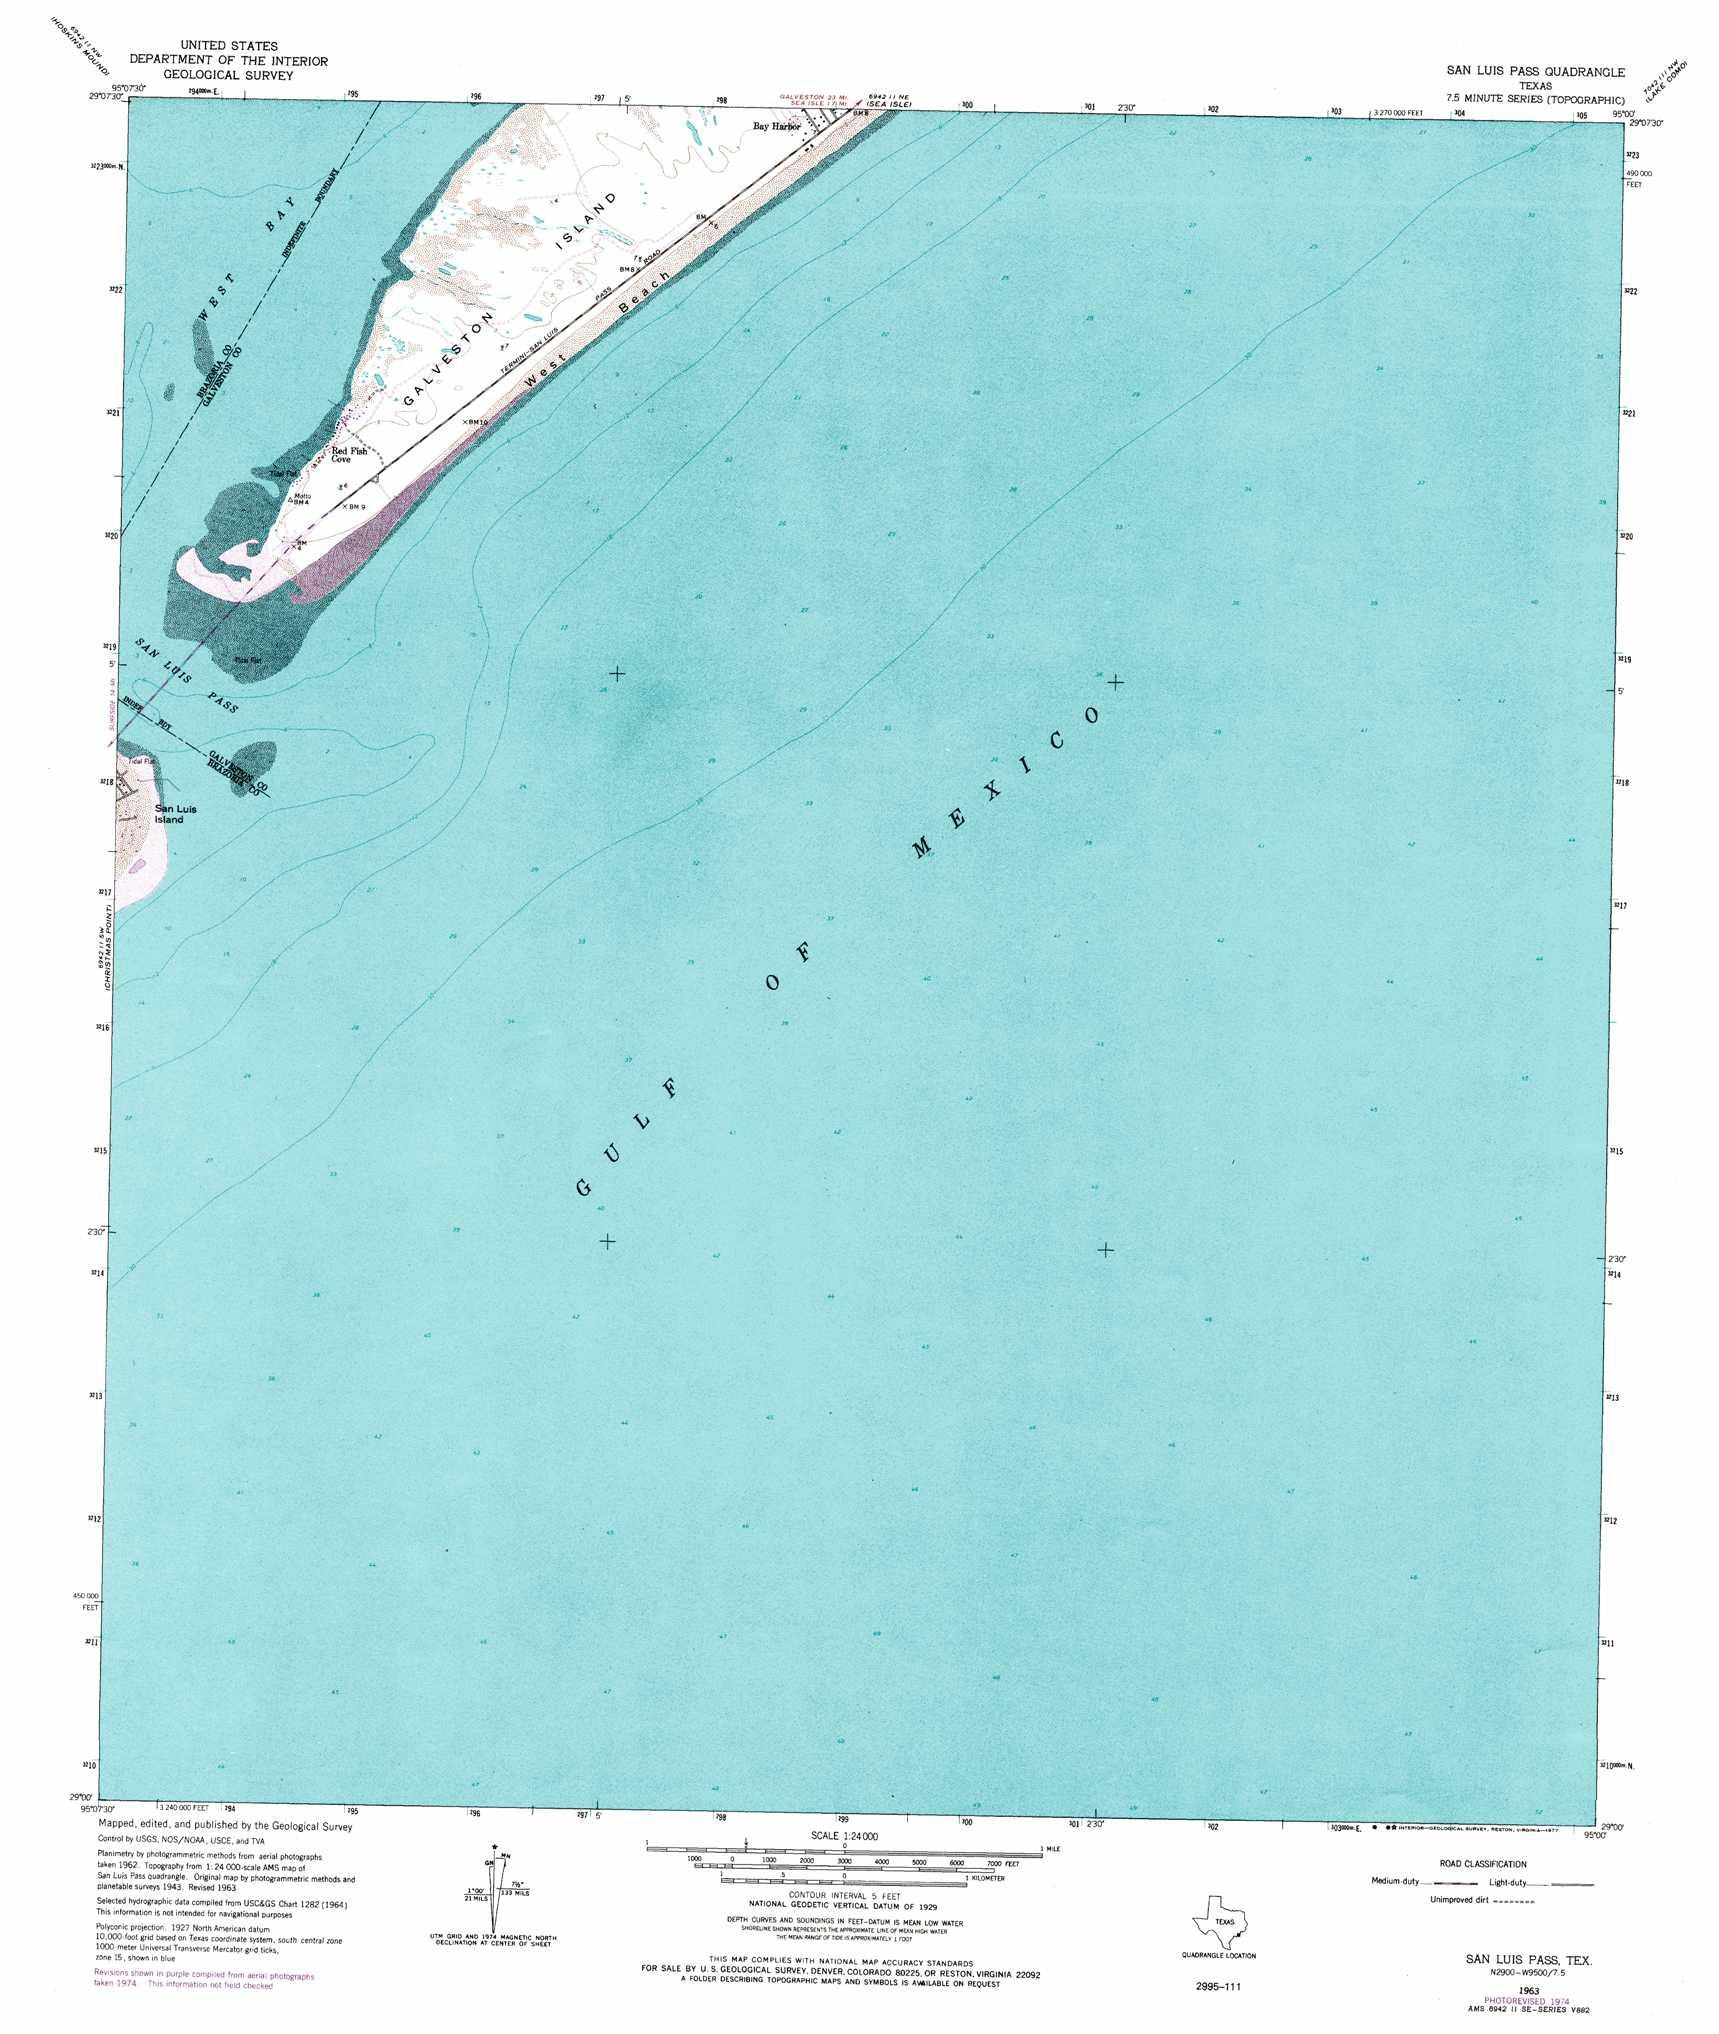 San Luis P topographic map, TX - USGS Topo Quad 29095a1 Map Of Sea Isle Texas on